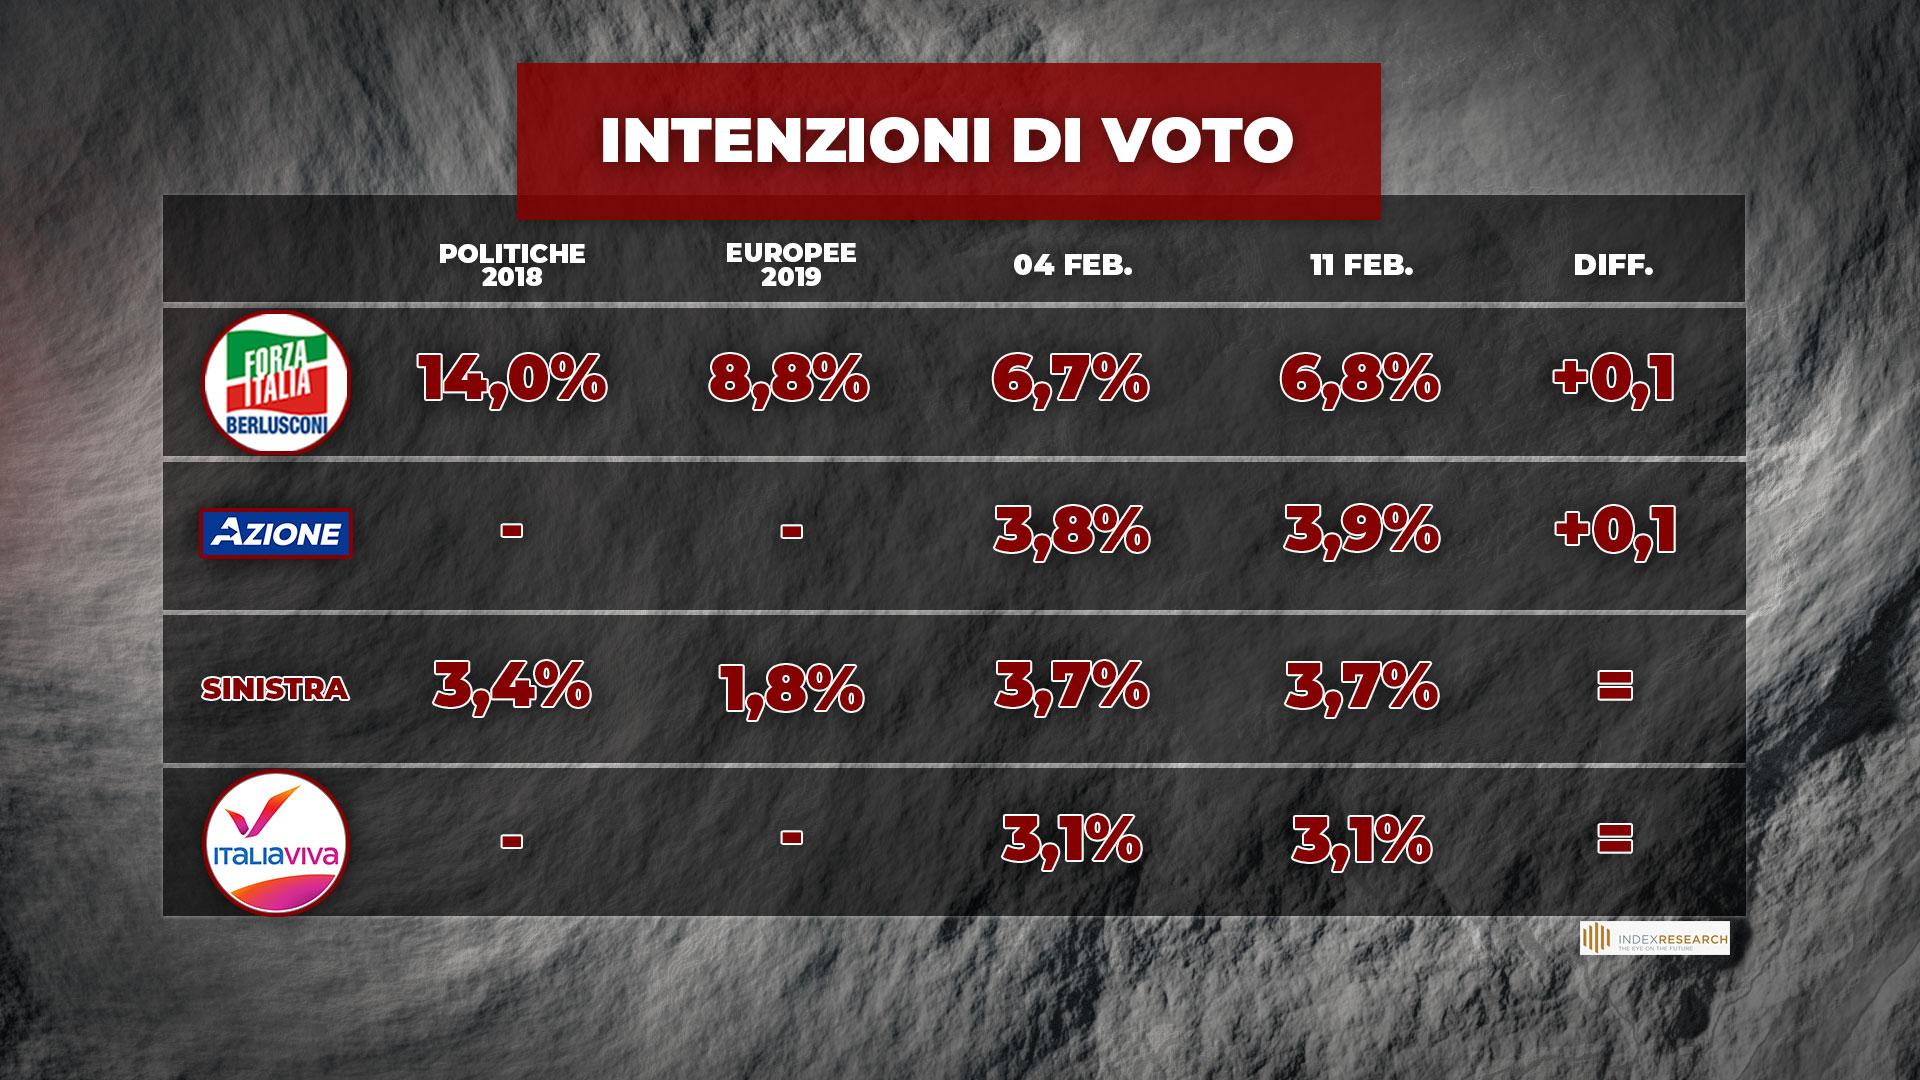 sondaggi politici oggi lega governo draghi 1